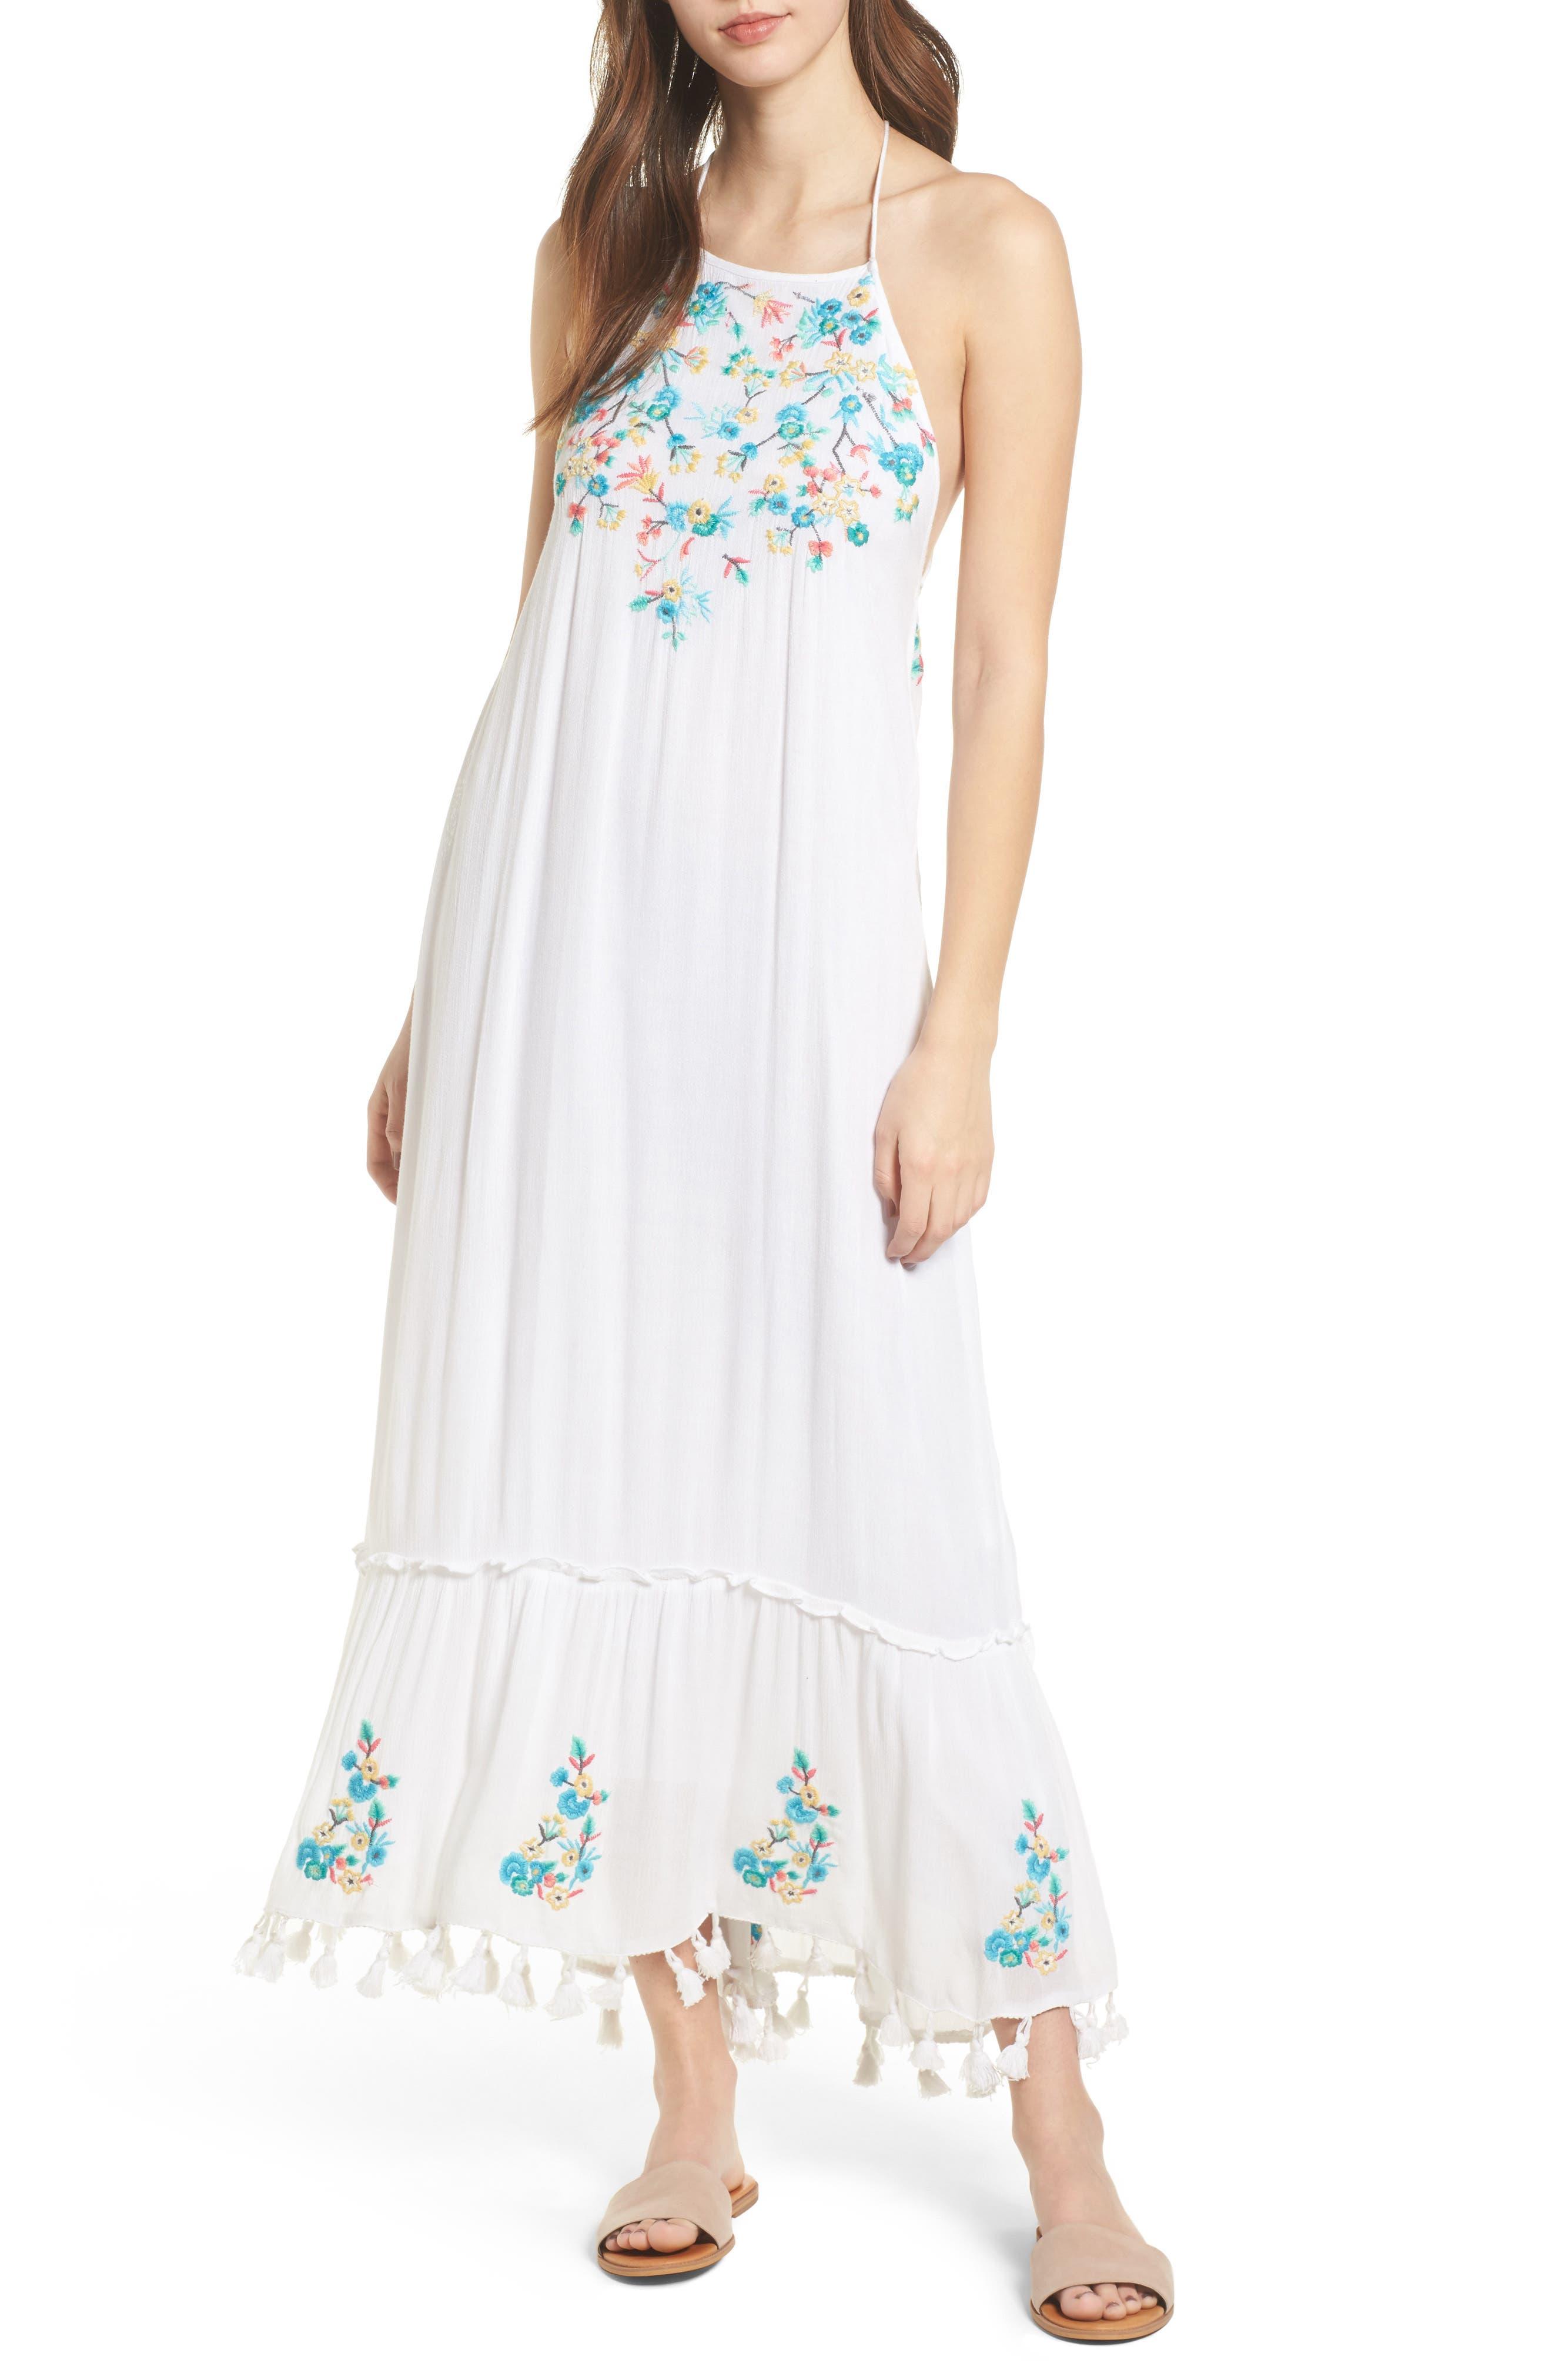 Ashlyn Embroidered Tassel Trim Maxi Dress,                             Main thumbnail 1, color,                             100